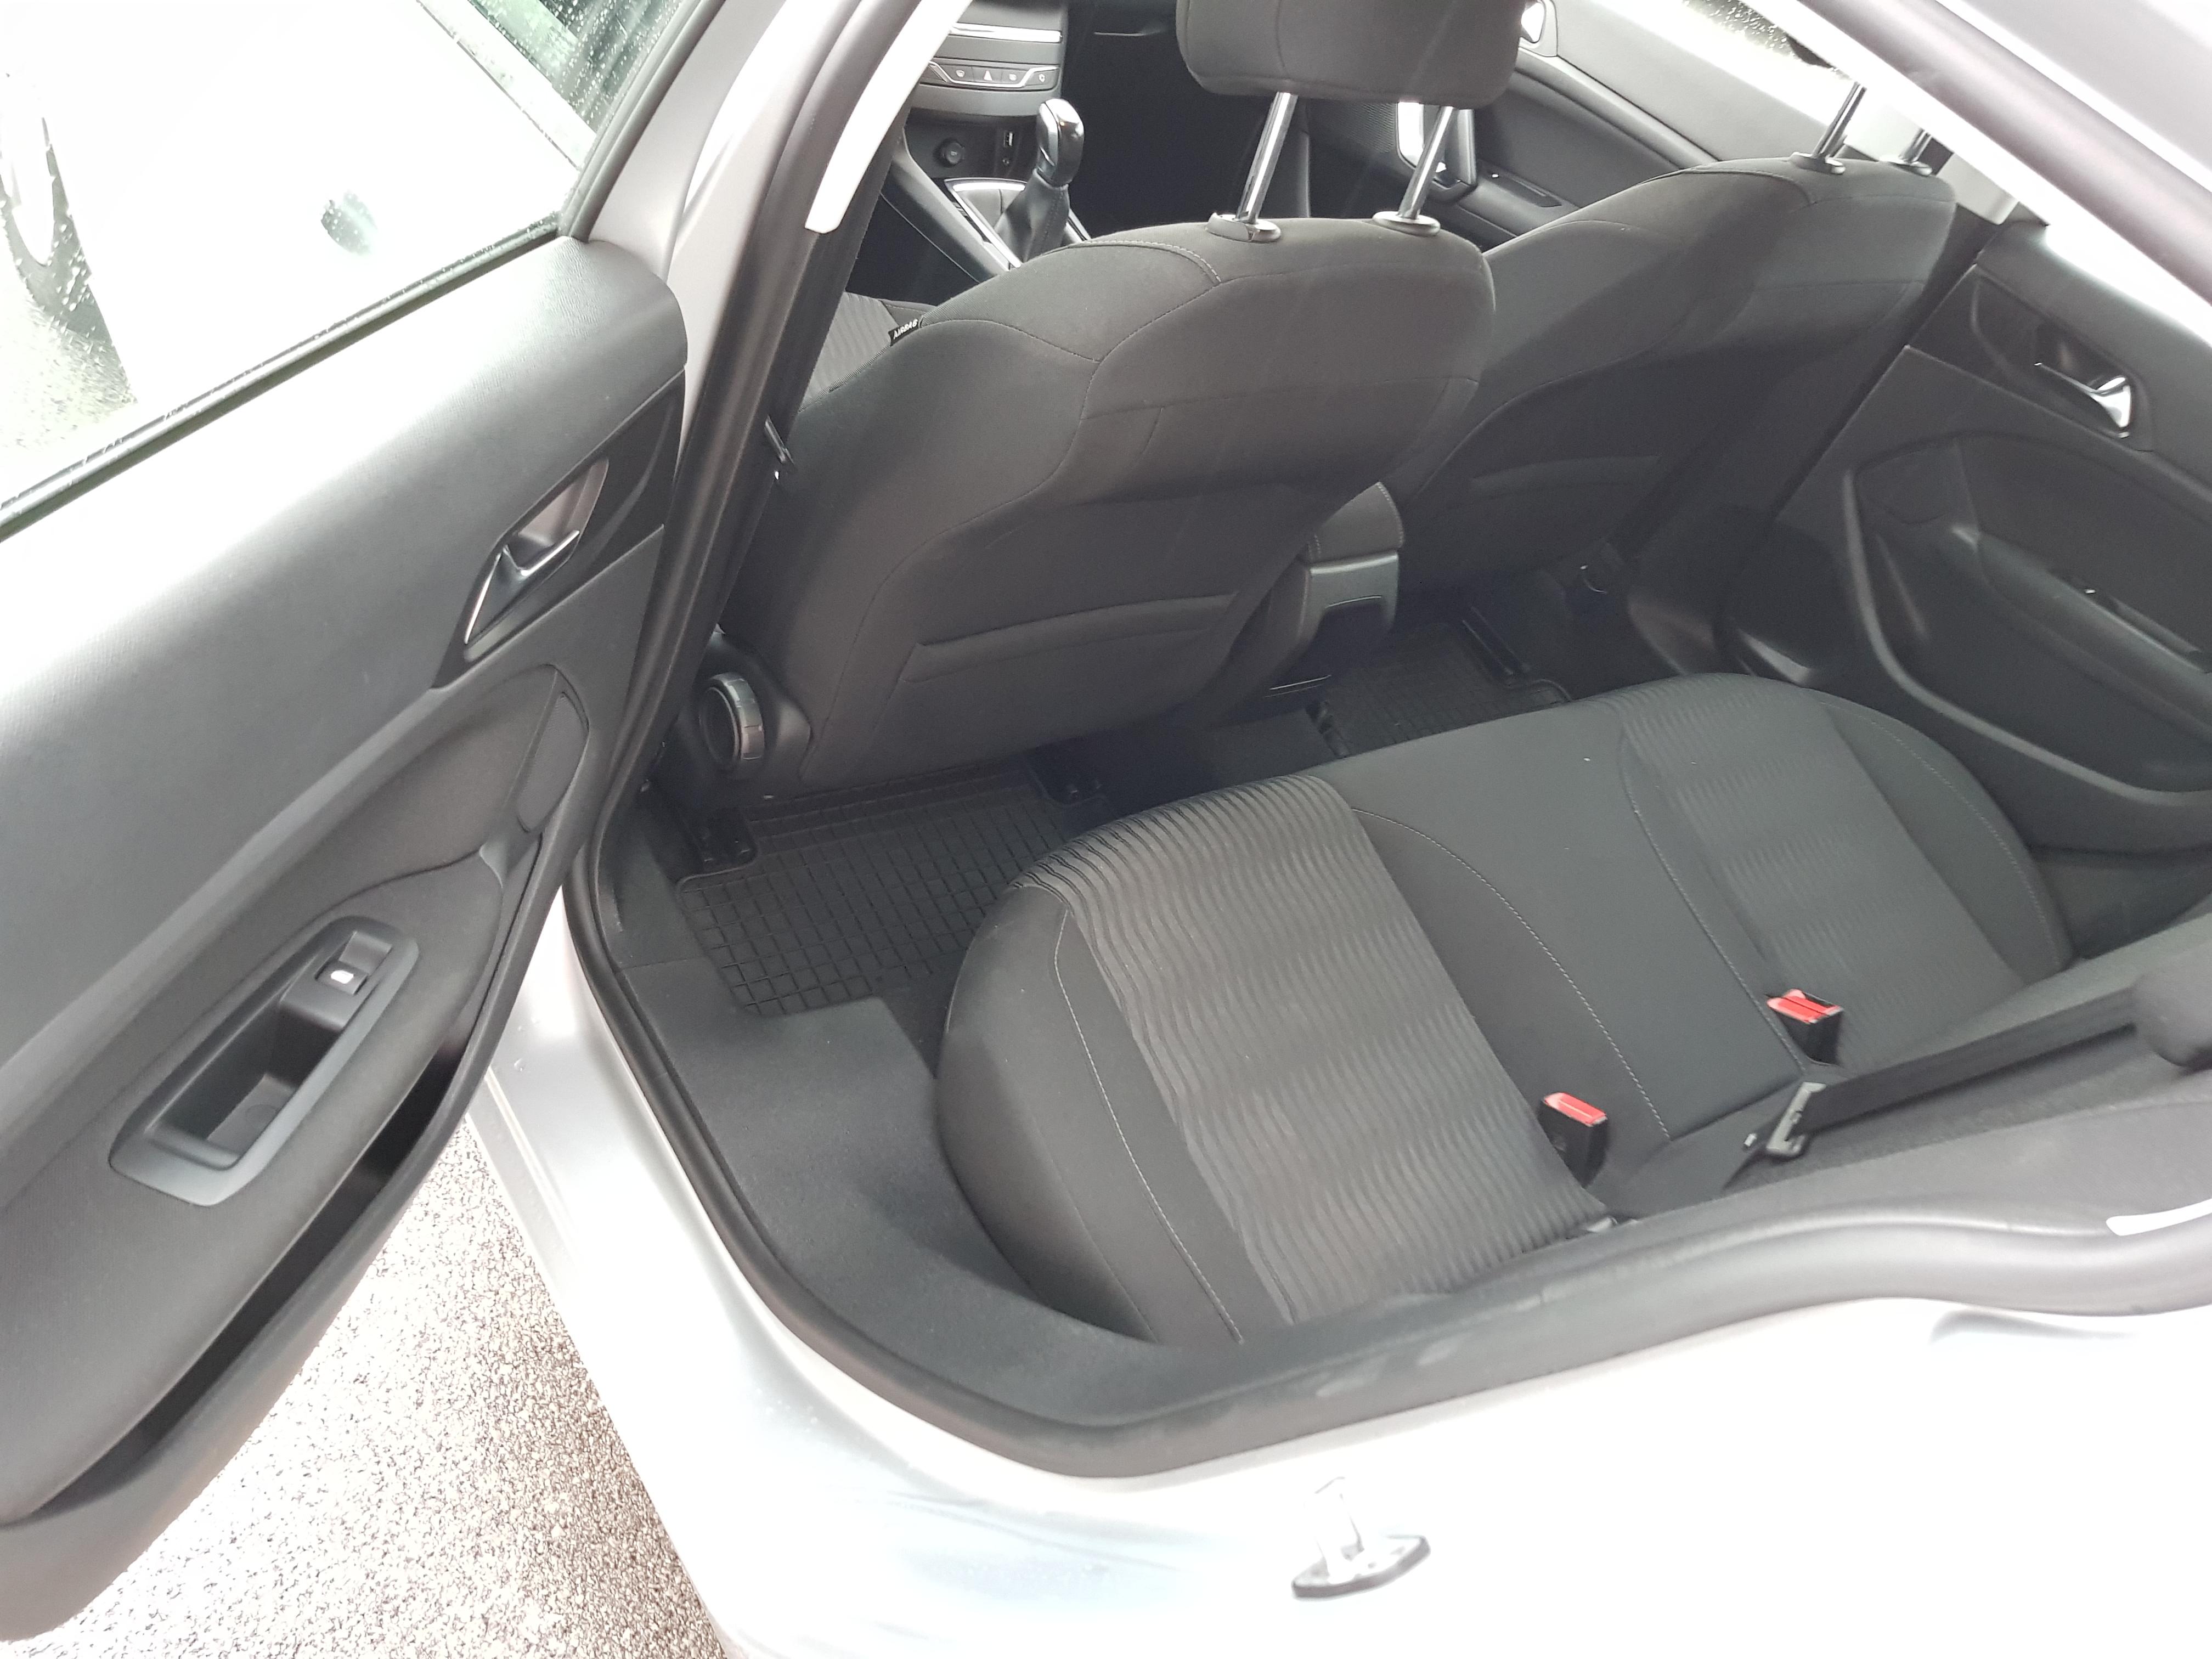 Peugeot 308 1.6 HDI Active - Provjerena rabljena vozila!